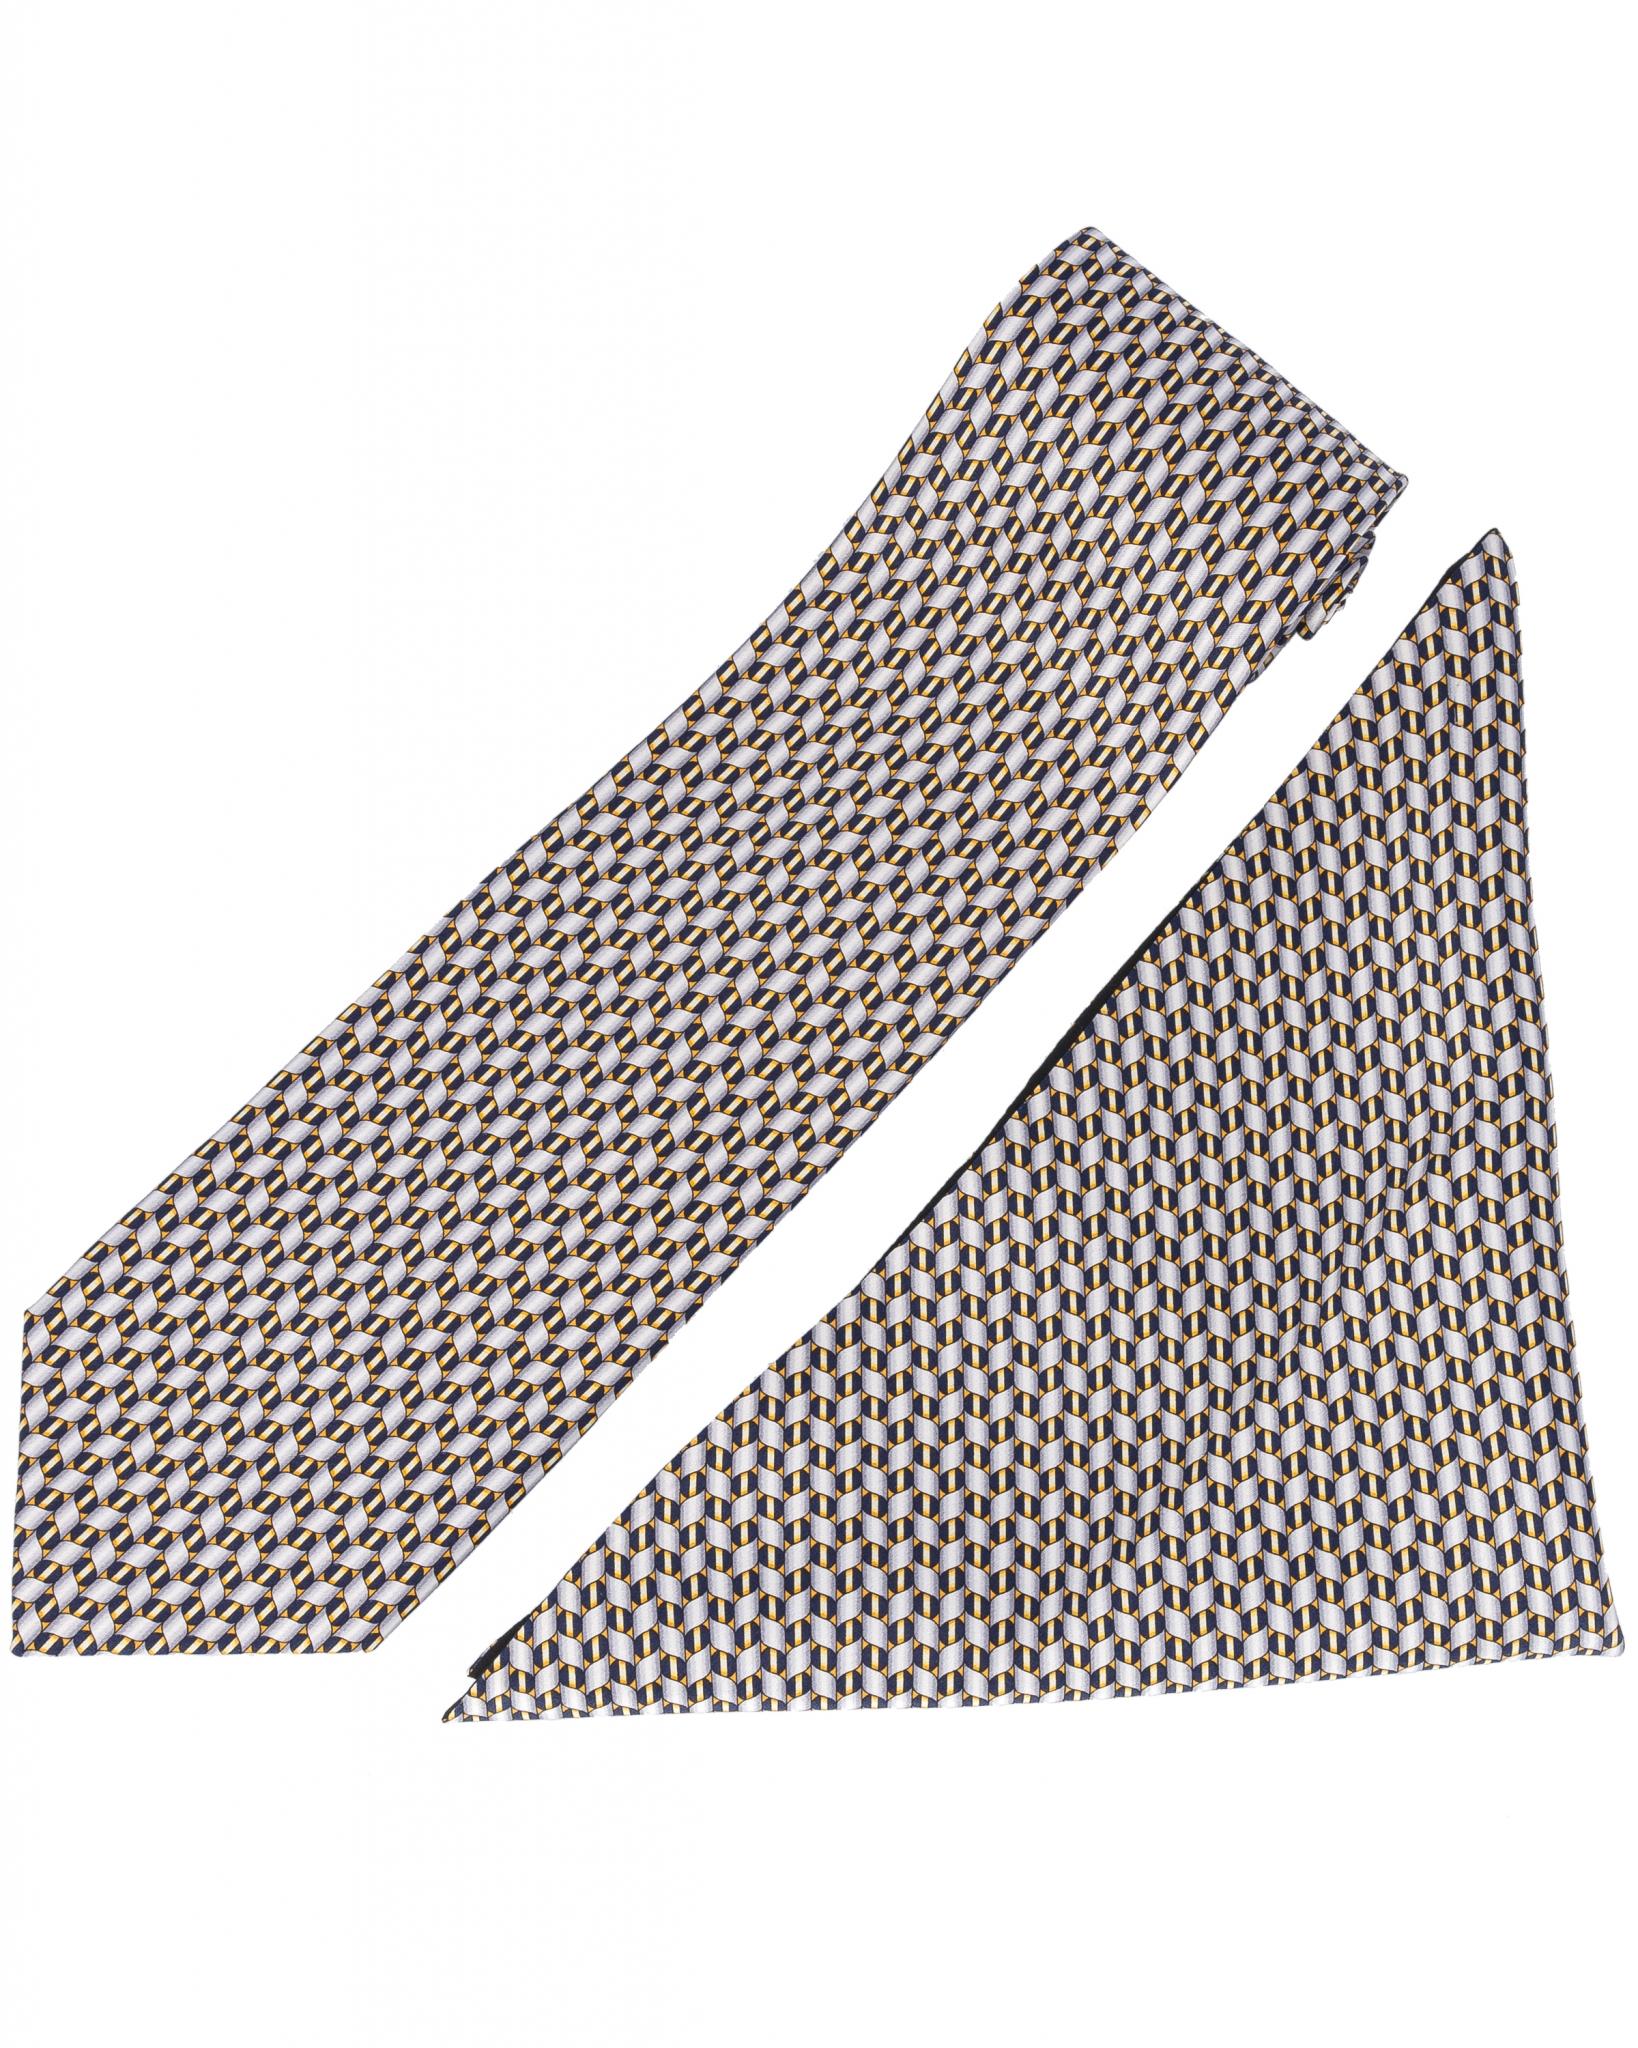 ZILLI – 100% Silk Tie & Pocket Square Set Grey 4392V02